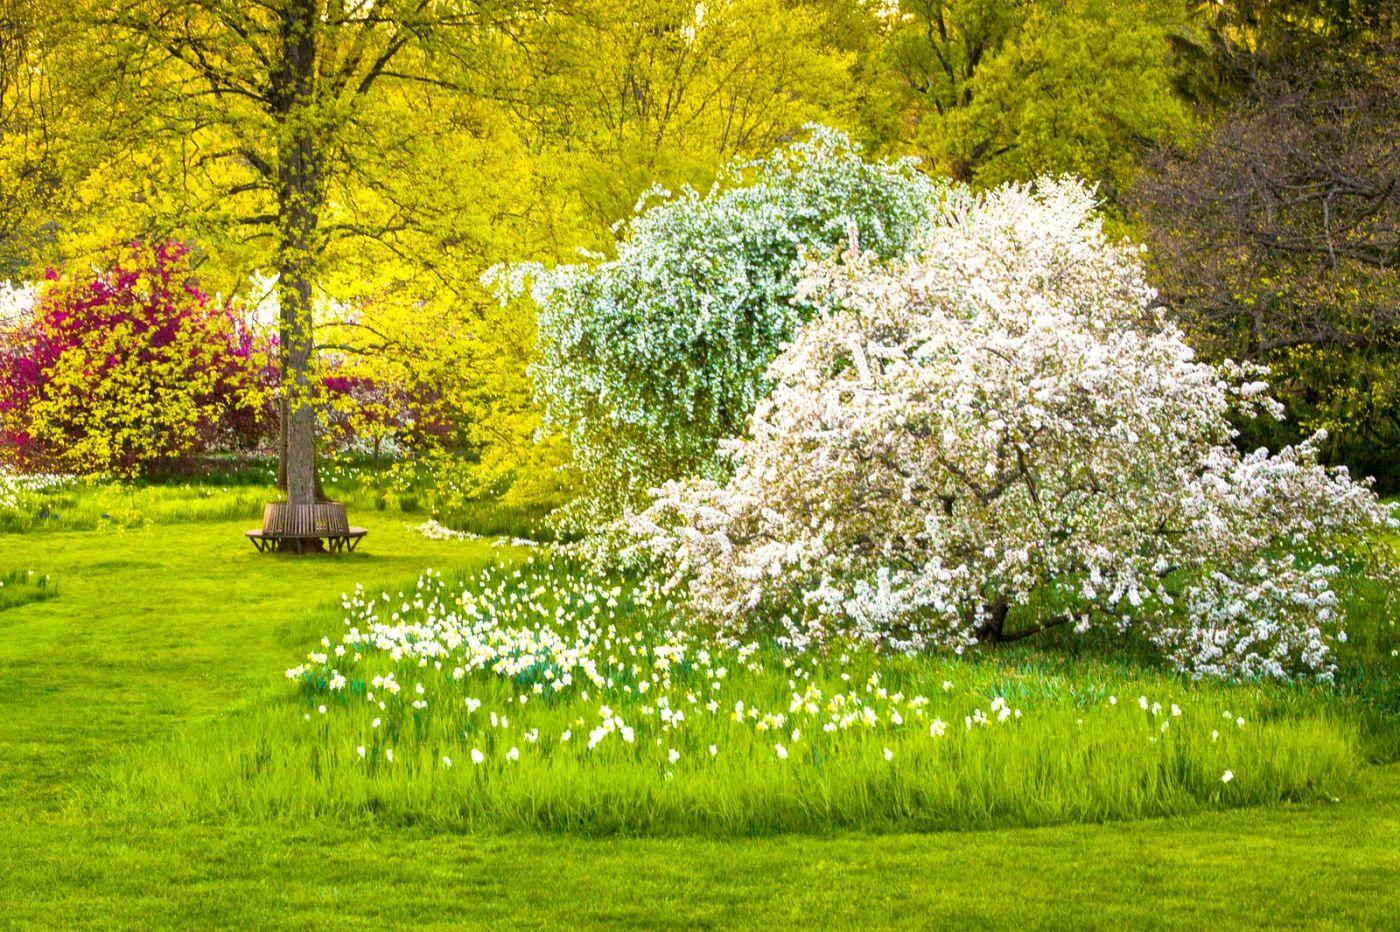 Chanticleer花园,点亮心灵_图1-17